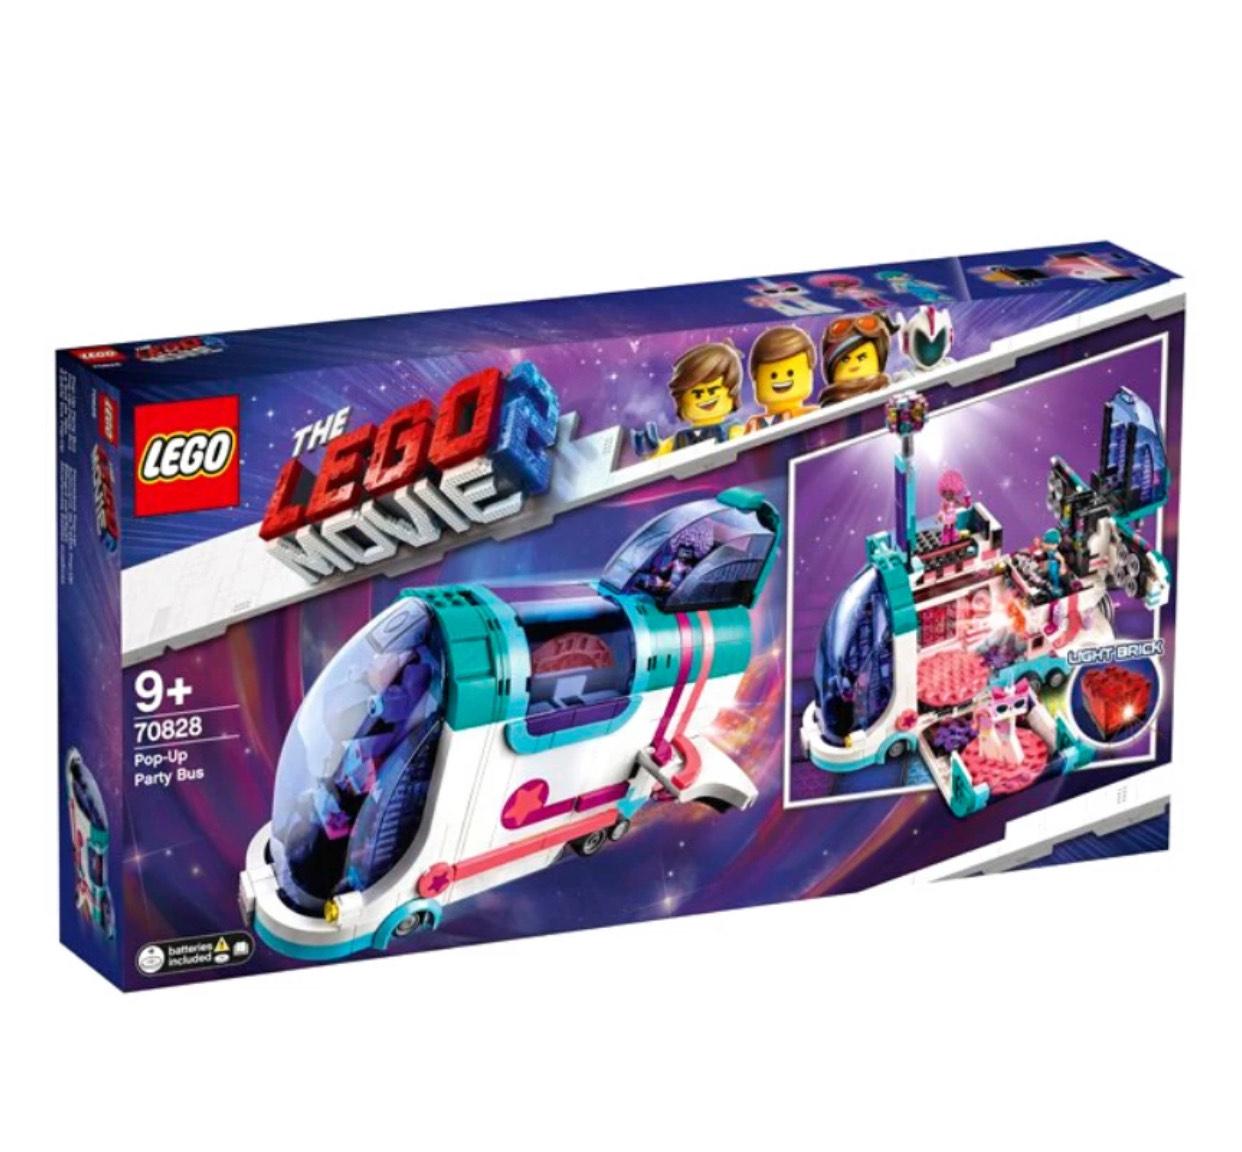 LEGO 70828 POP-UP PARTY BUS SET £30/ LEGO 70830 SWEET MAYHEM'S SYSTAR STARSHIP SET £20 @ Poundtoy